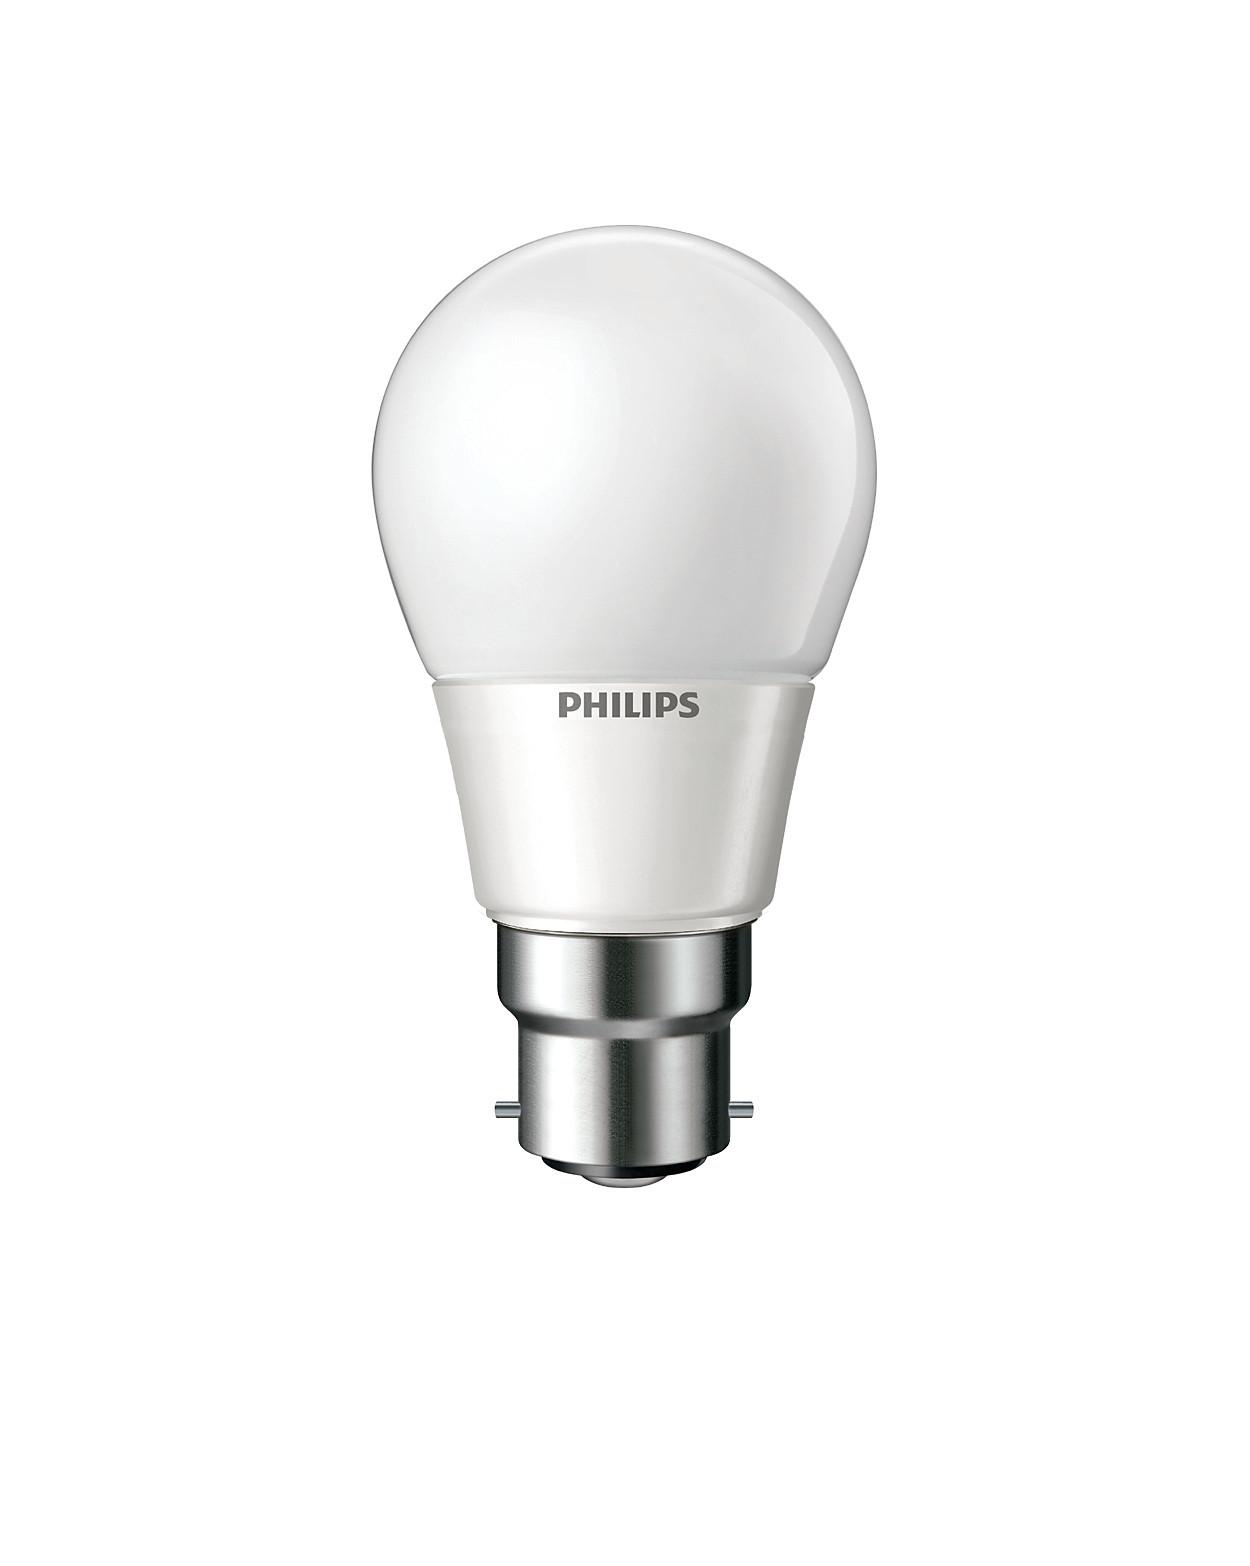 myaccent ampoule led 872790091832800 philips. Black Bedroom Furniture Sets. Home Design Ideas